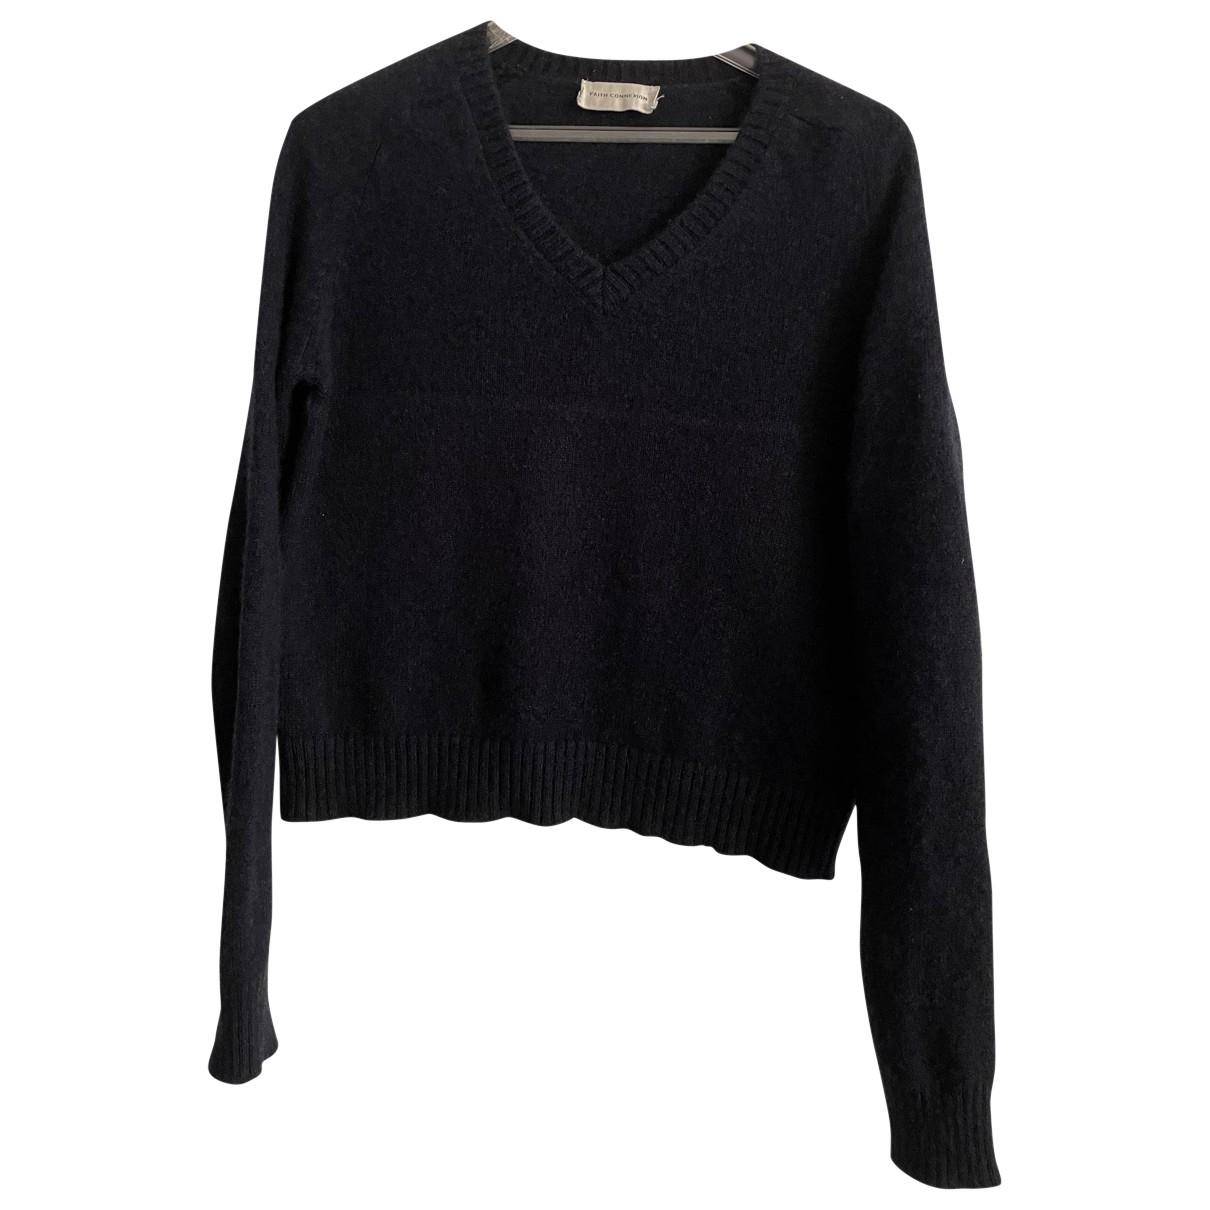 Faith Connexion N Blue Cashmere Knitwear for Women M International